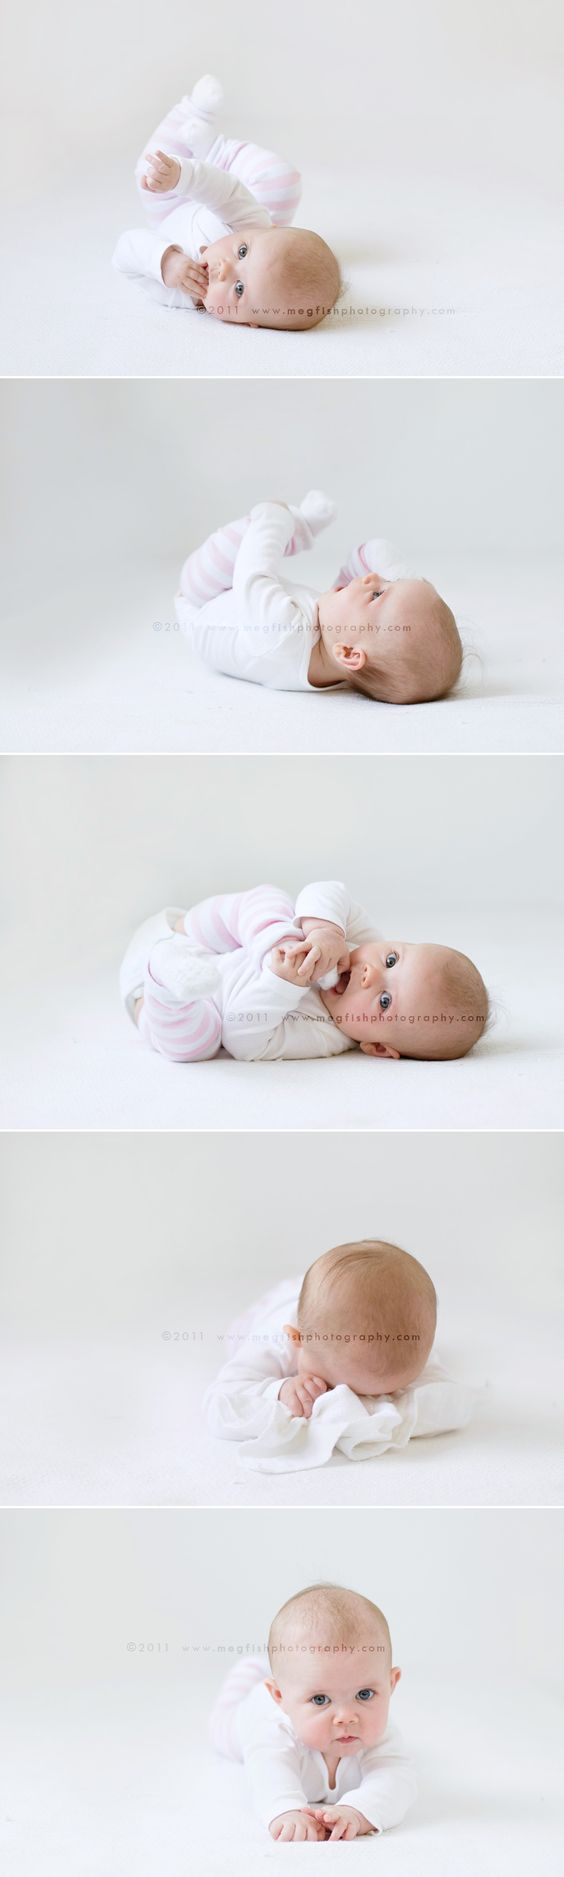 Baby's cuteness speaks for itself. No props needed. :)